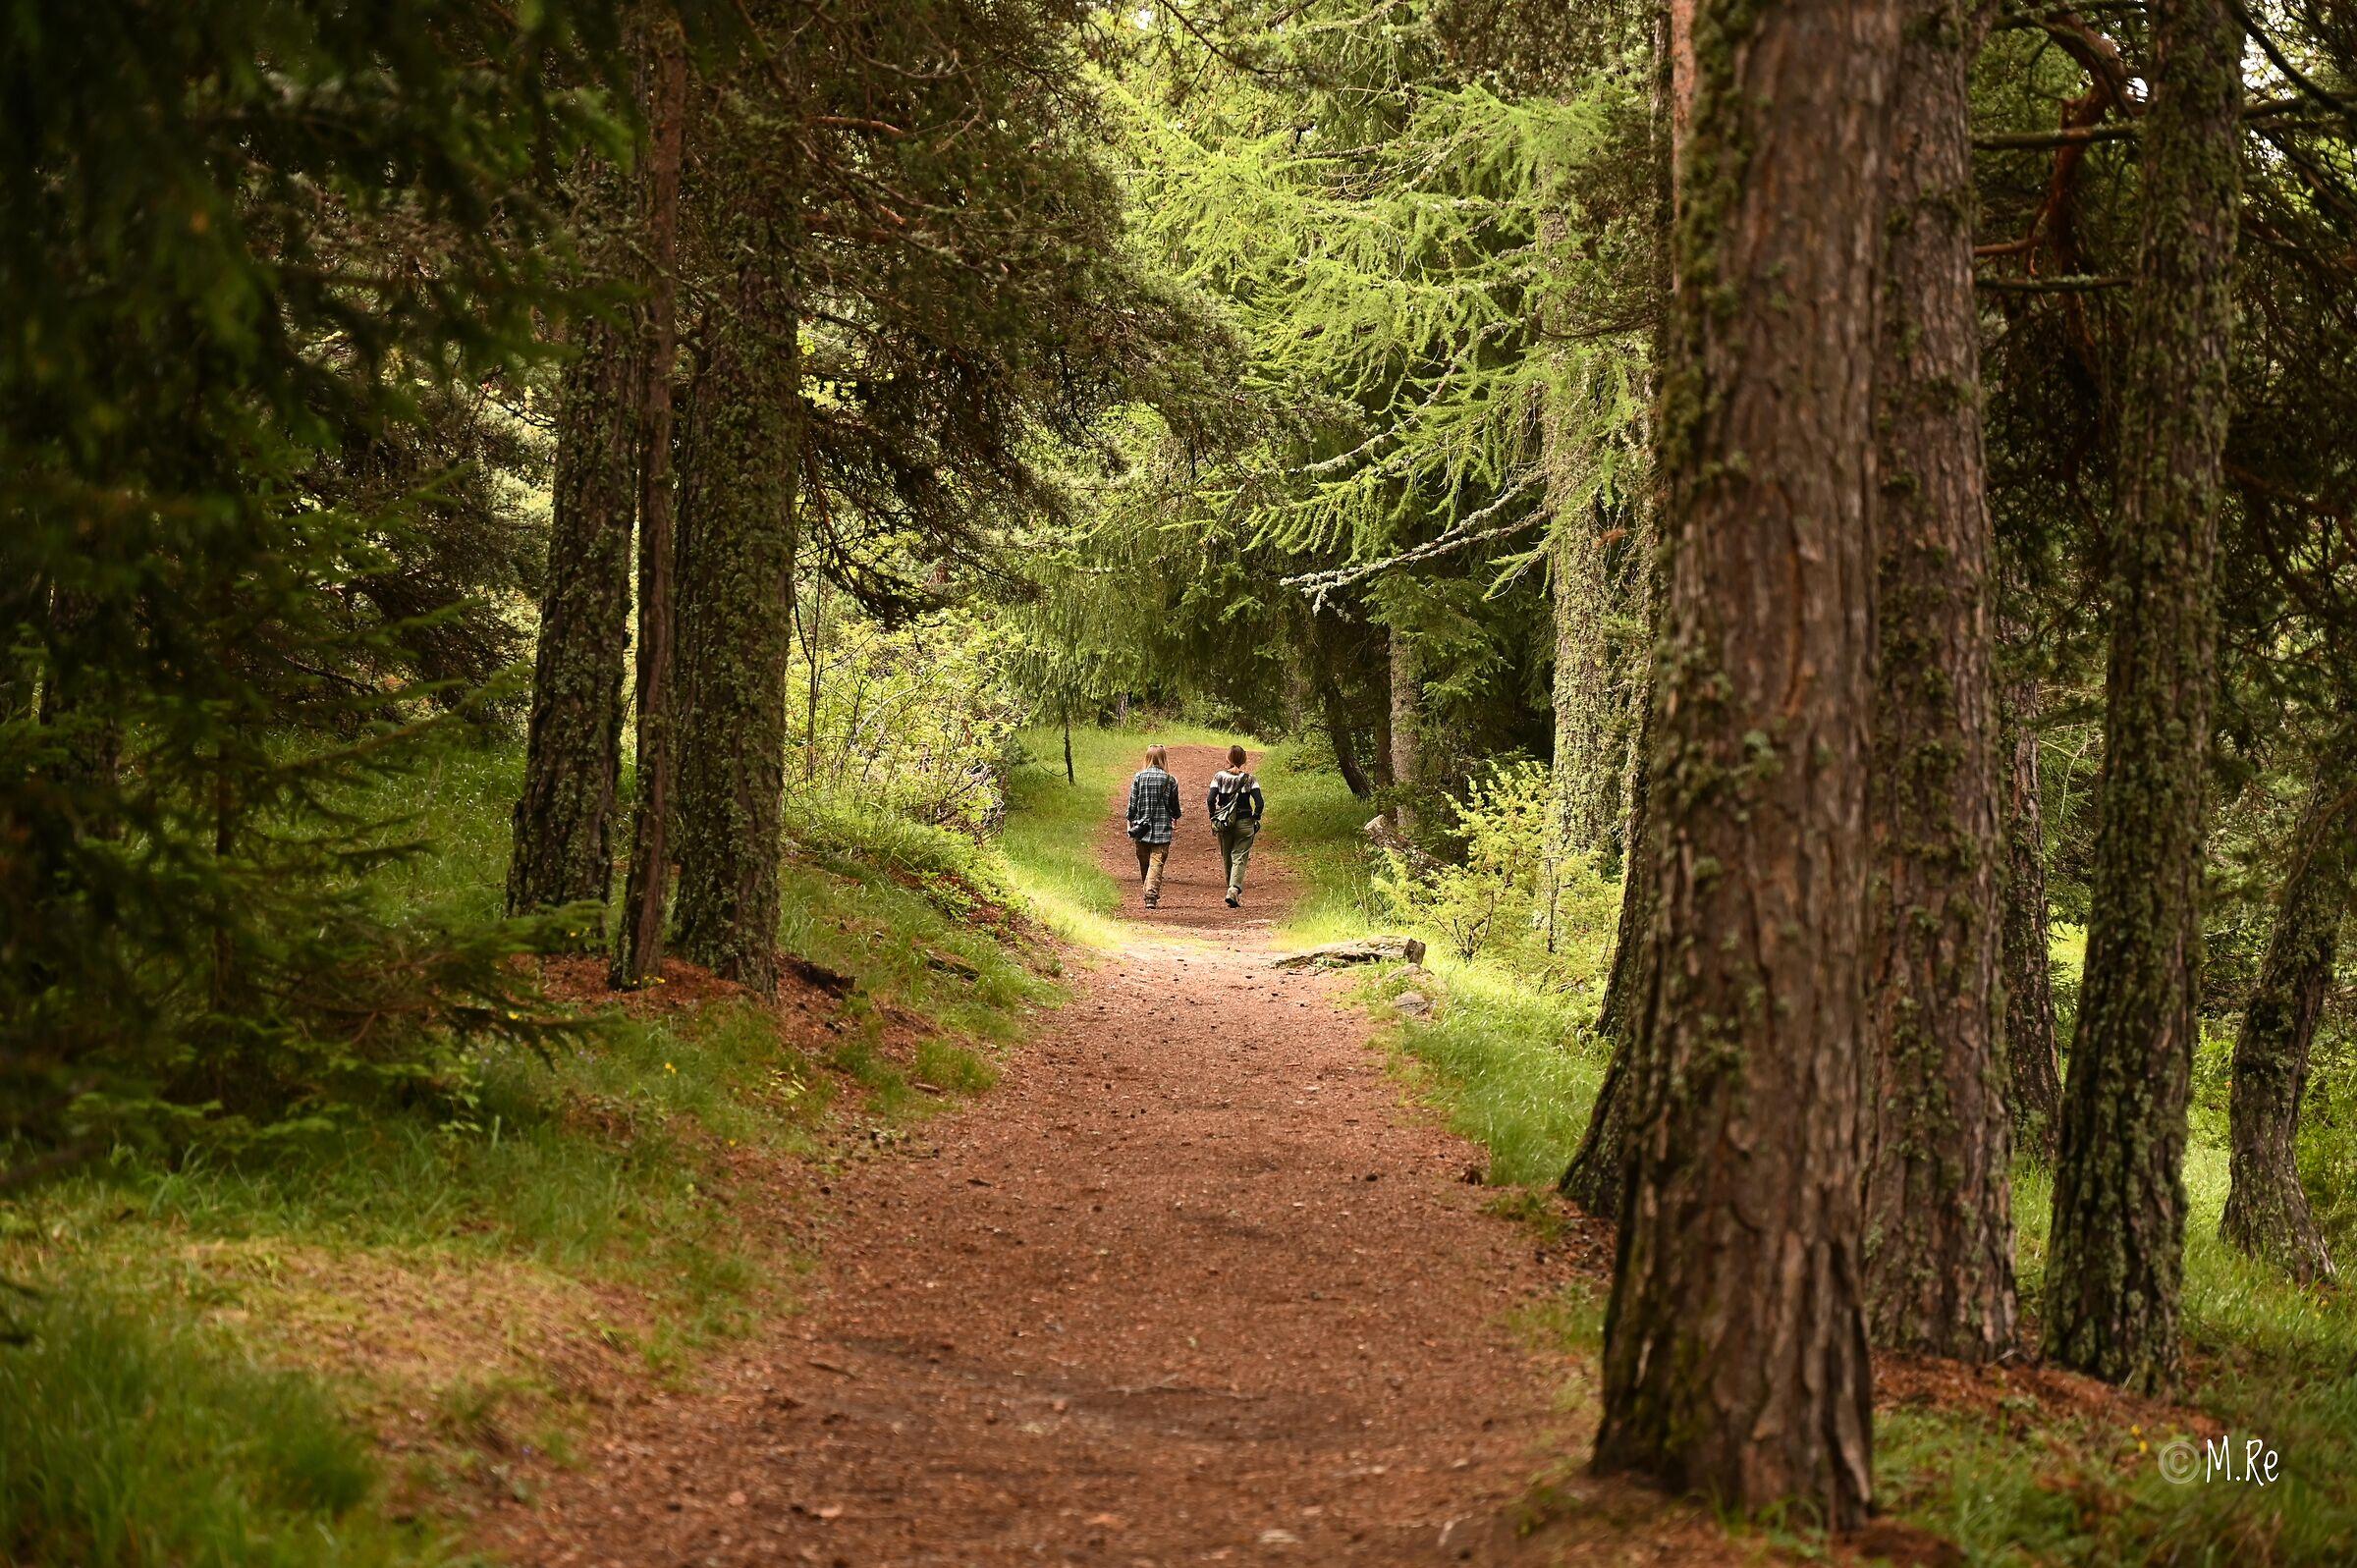 Walking in the woods...